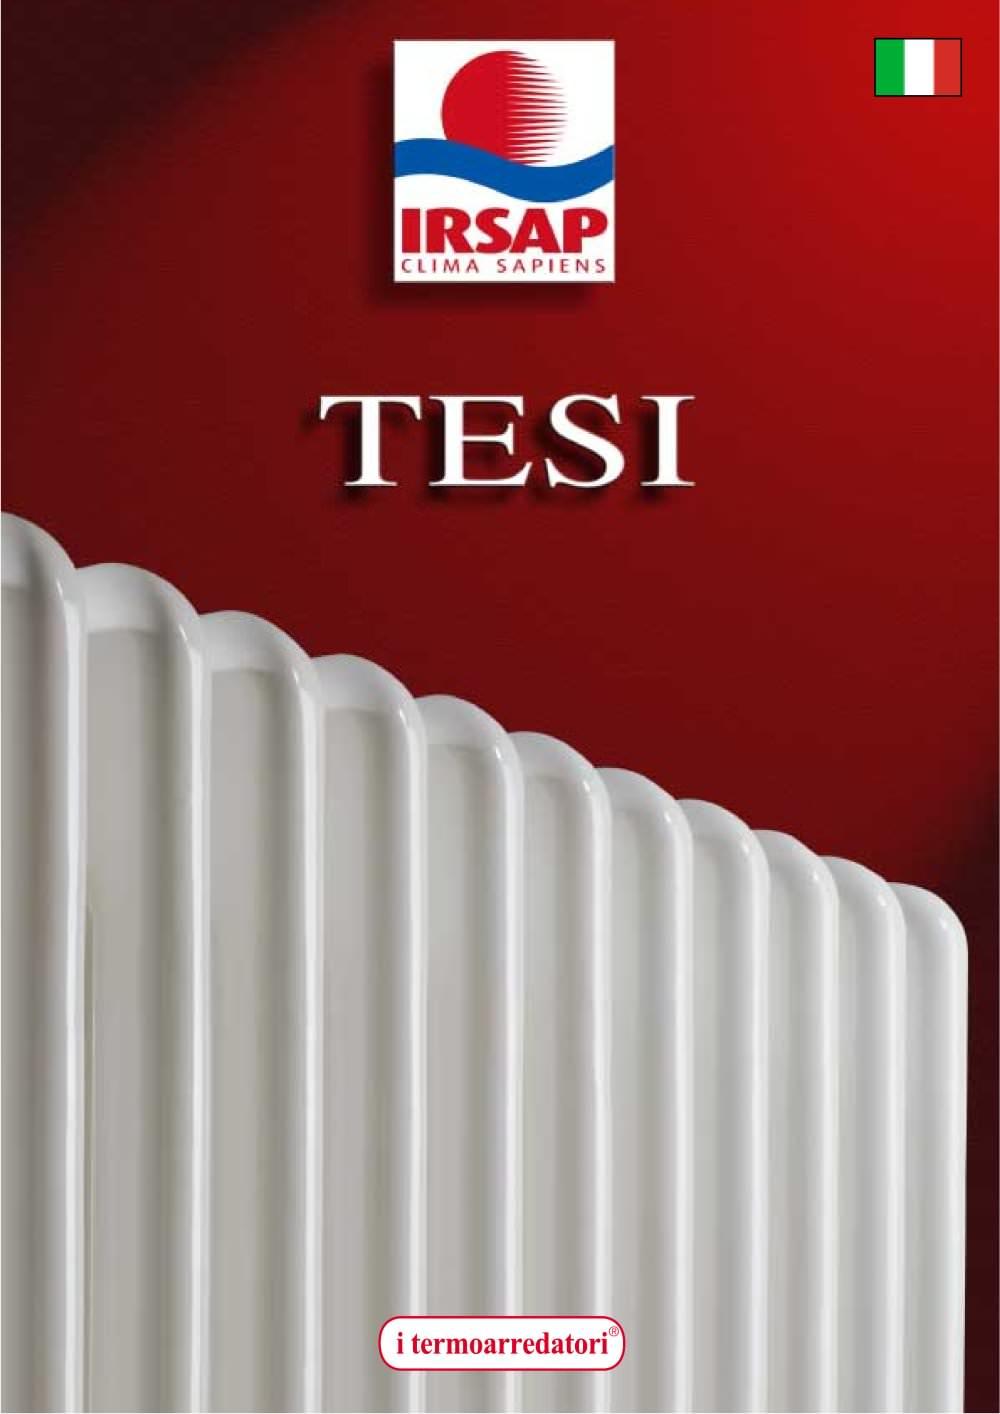 TESI - IRSAP - Catálogo PDF   Documentación   Brochure